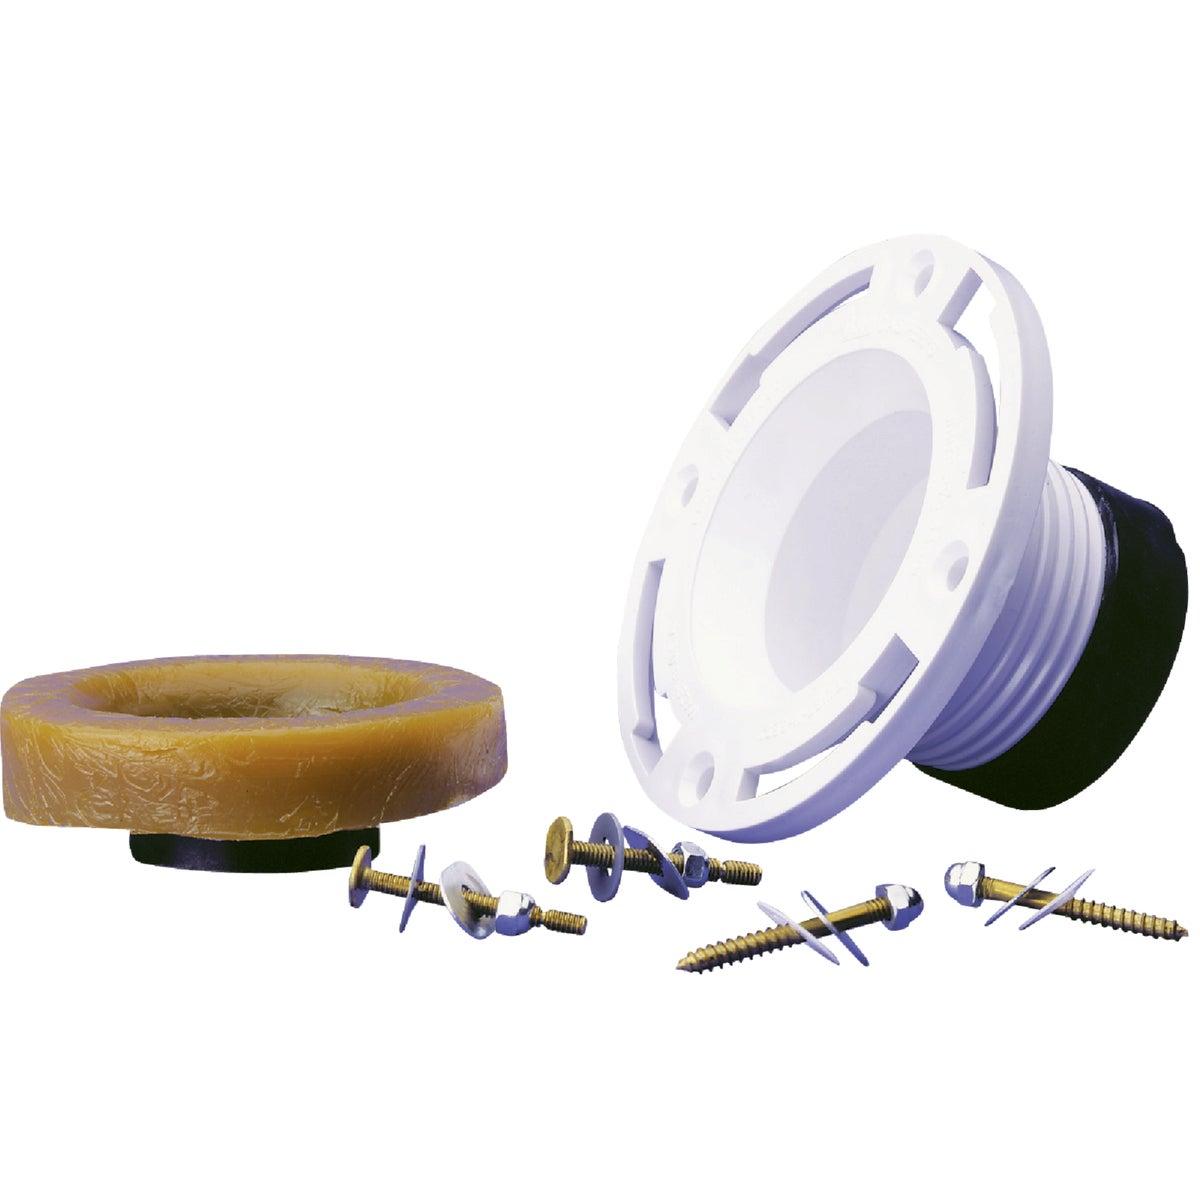 Oatey PVC FLANGE REPAIR KIT 43652